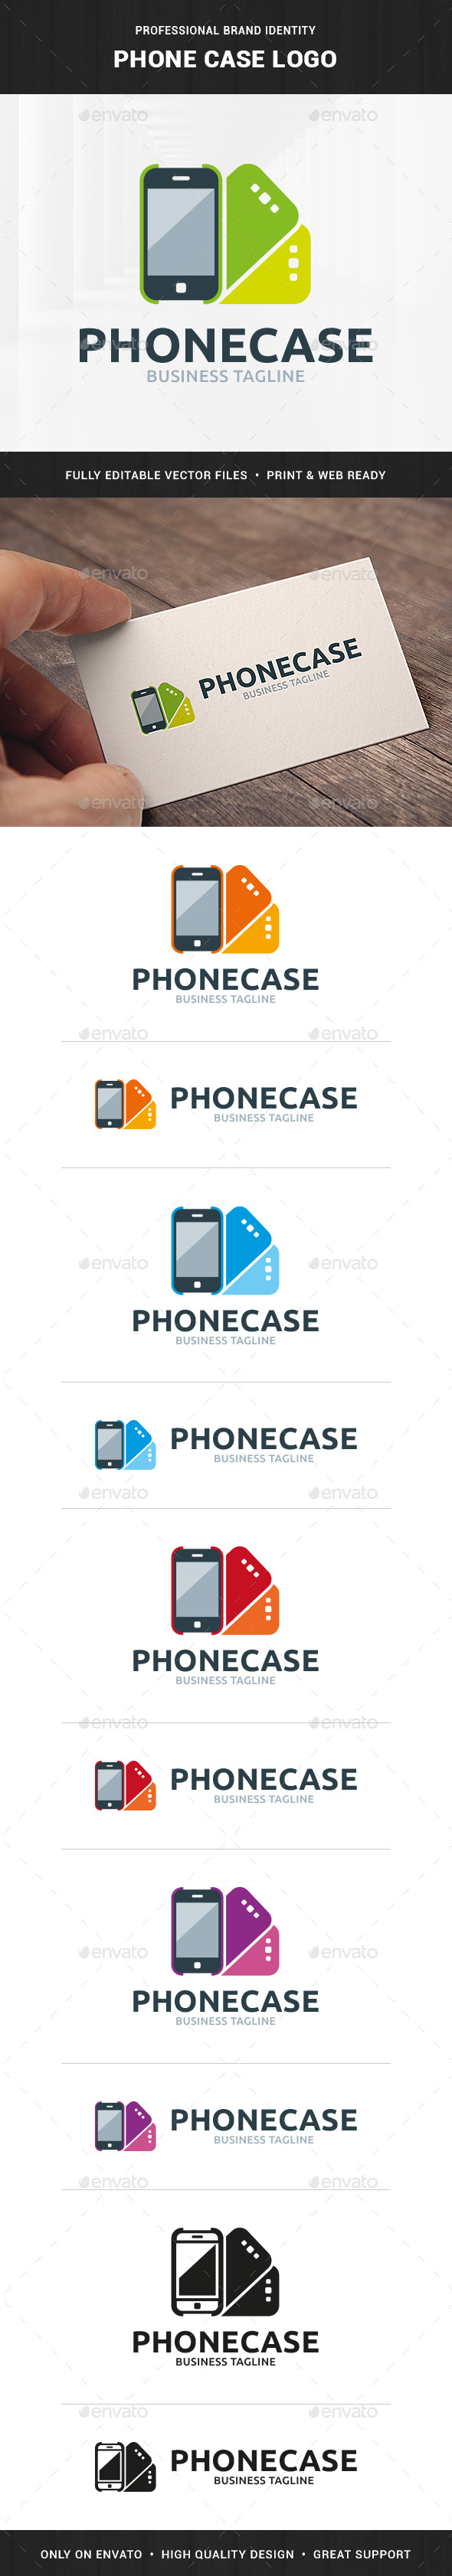 Phone Case Logo Template